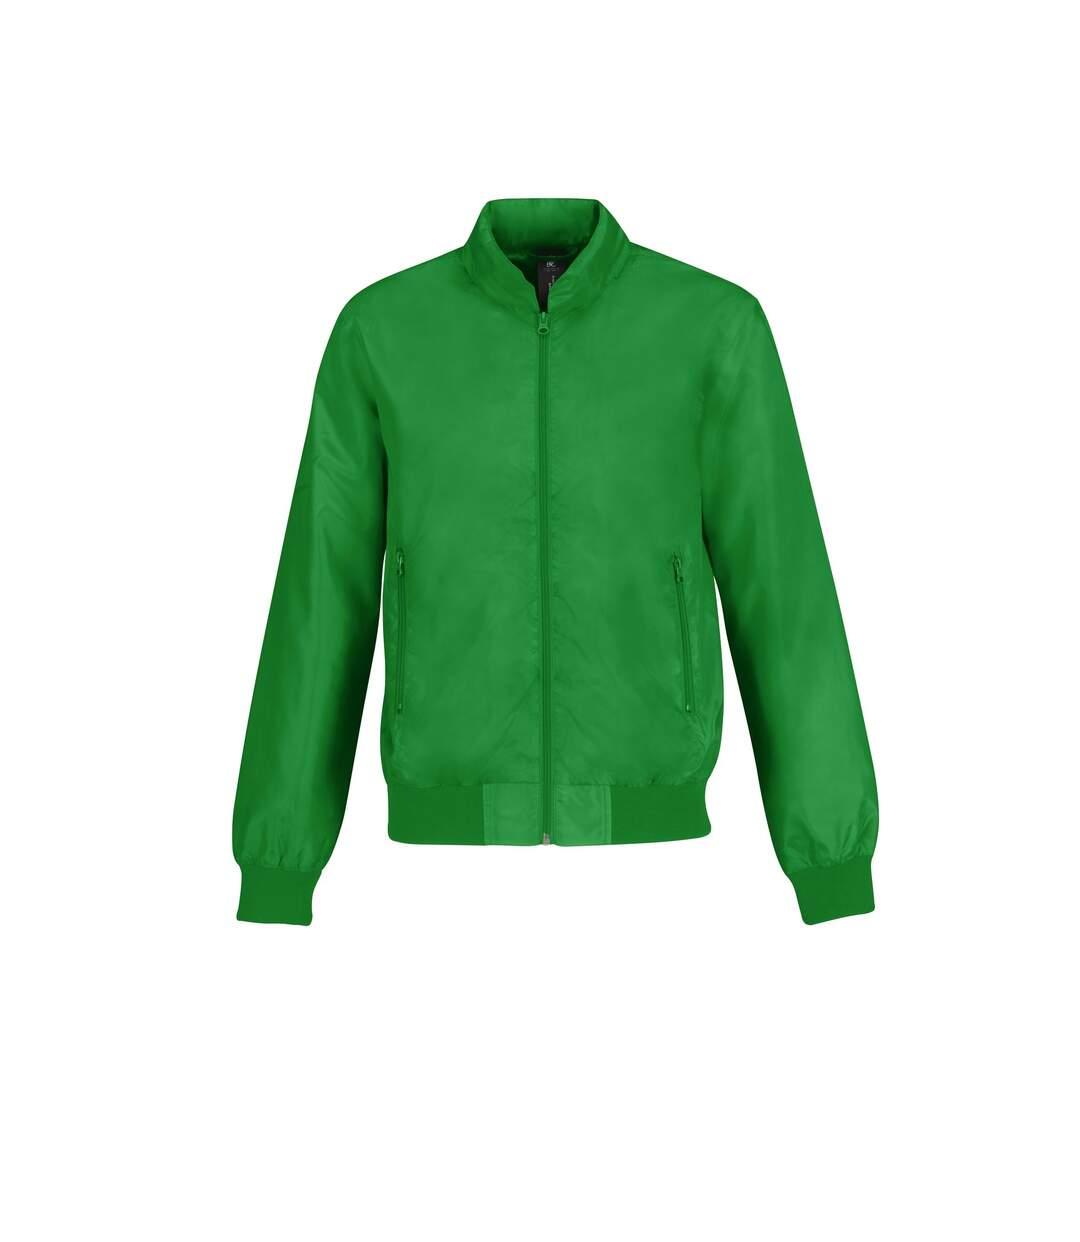 B&C Mens Trooper Lightweight Hooded Bomber Jacket (Real Green/ Neon Orange) - UTRW4832